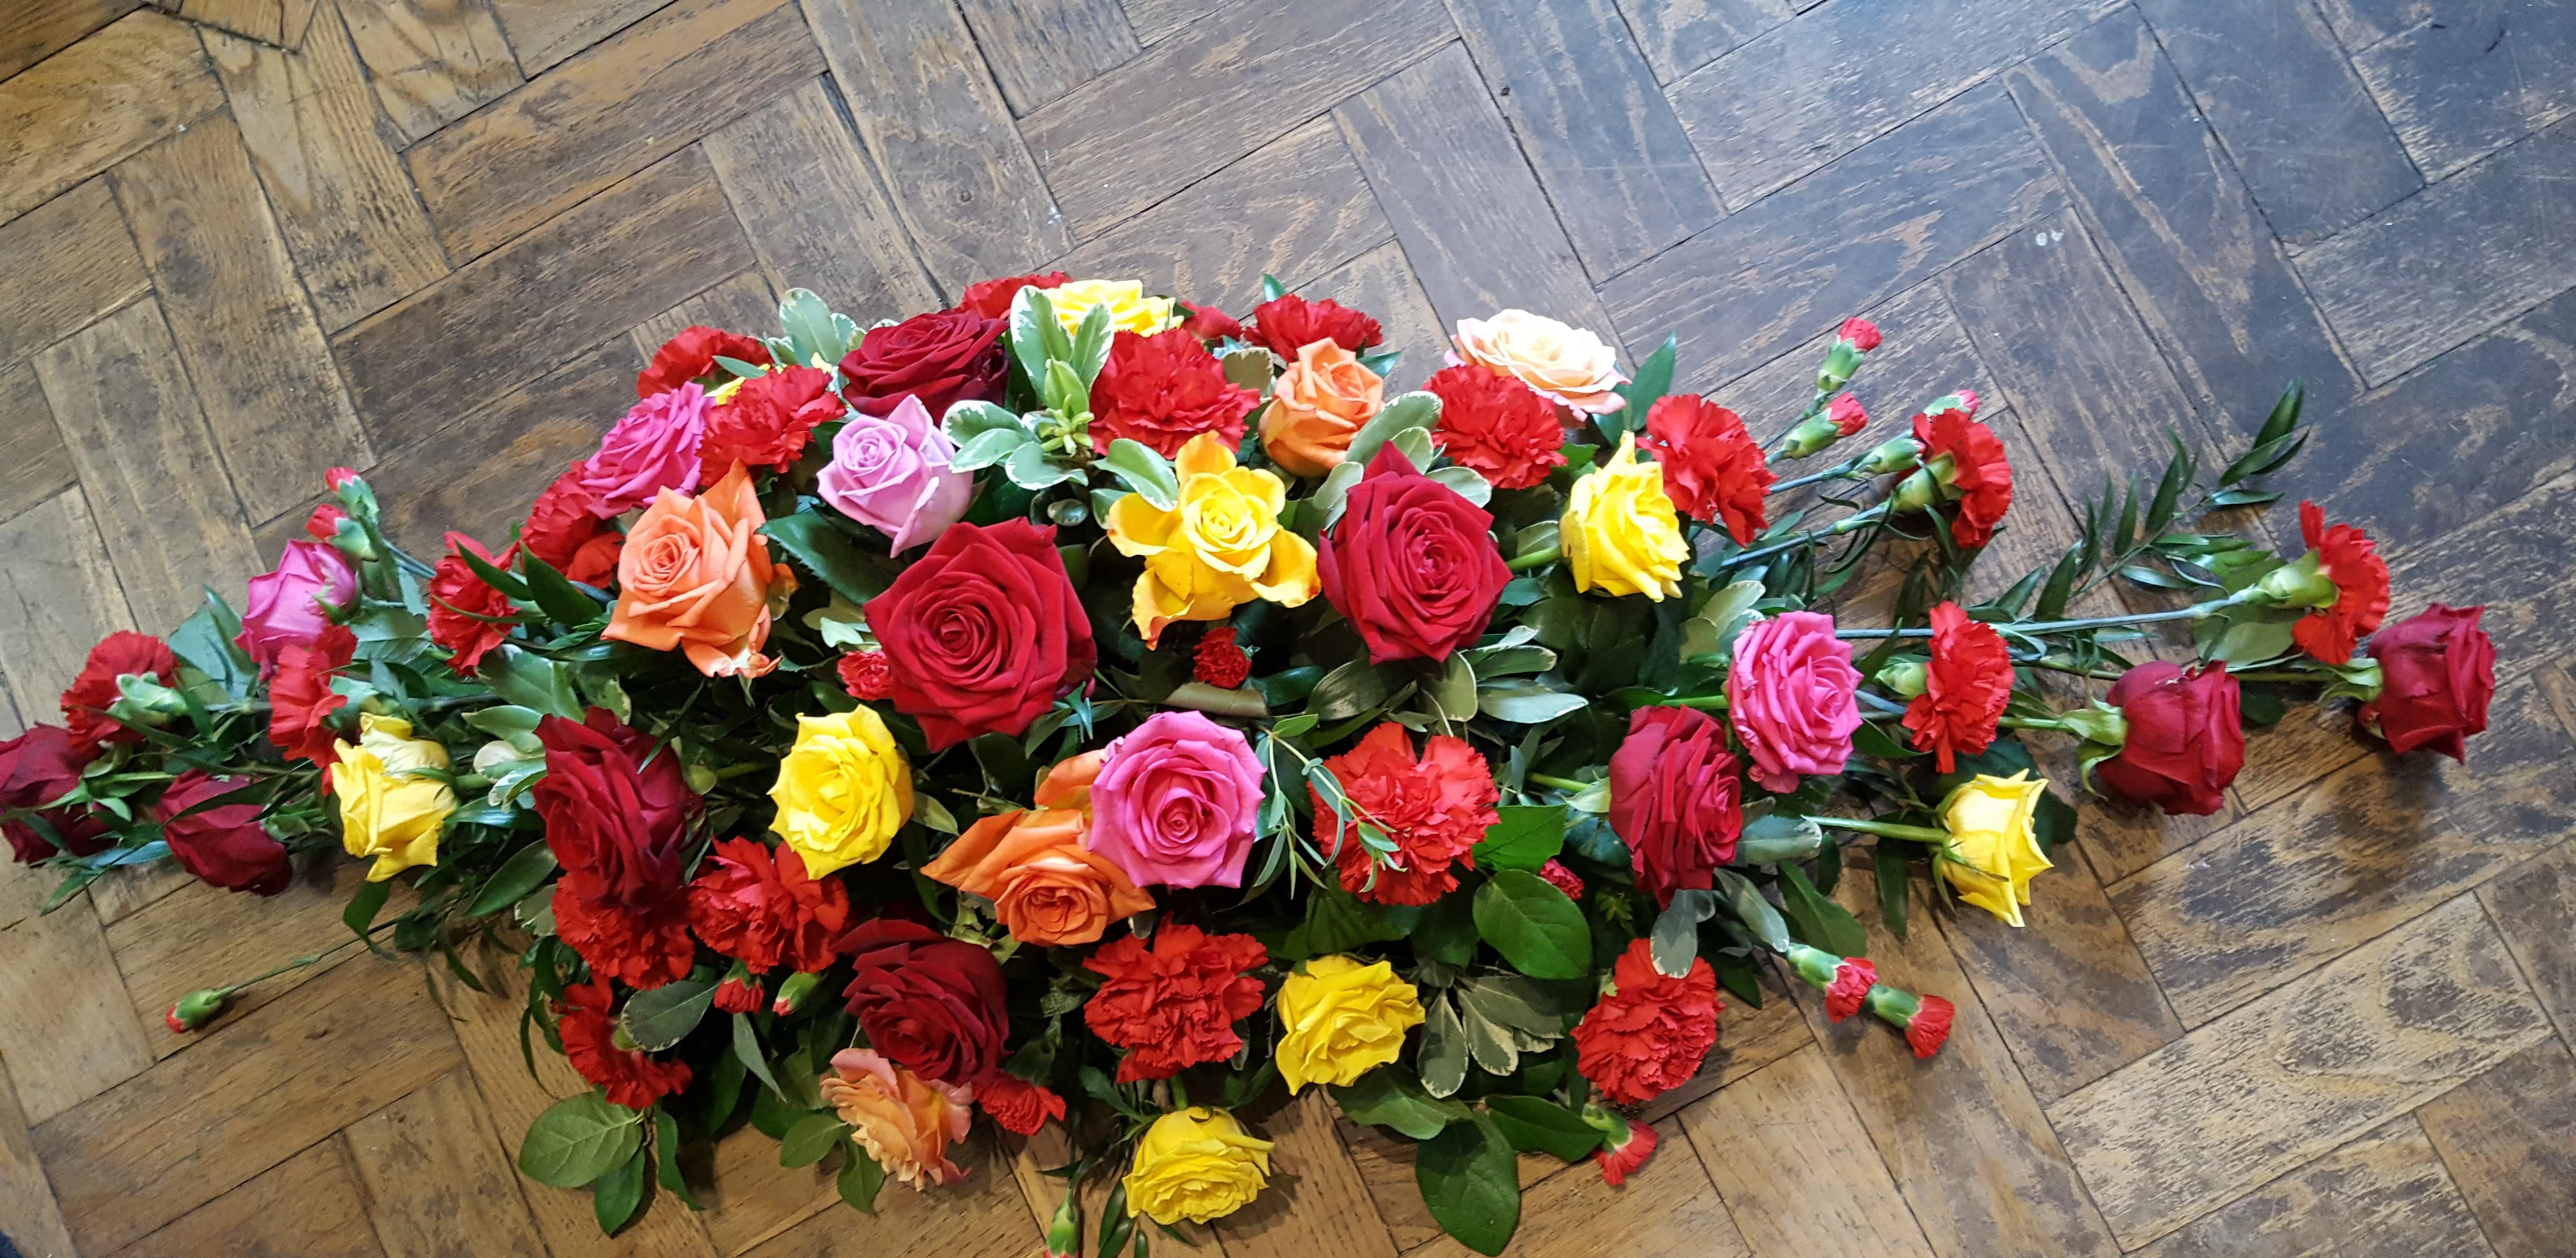 Mix Rose and Carnation Casket Spray